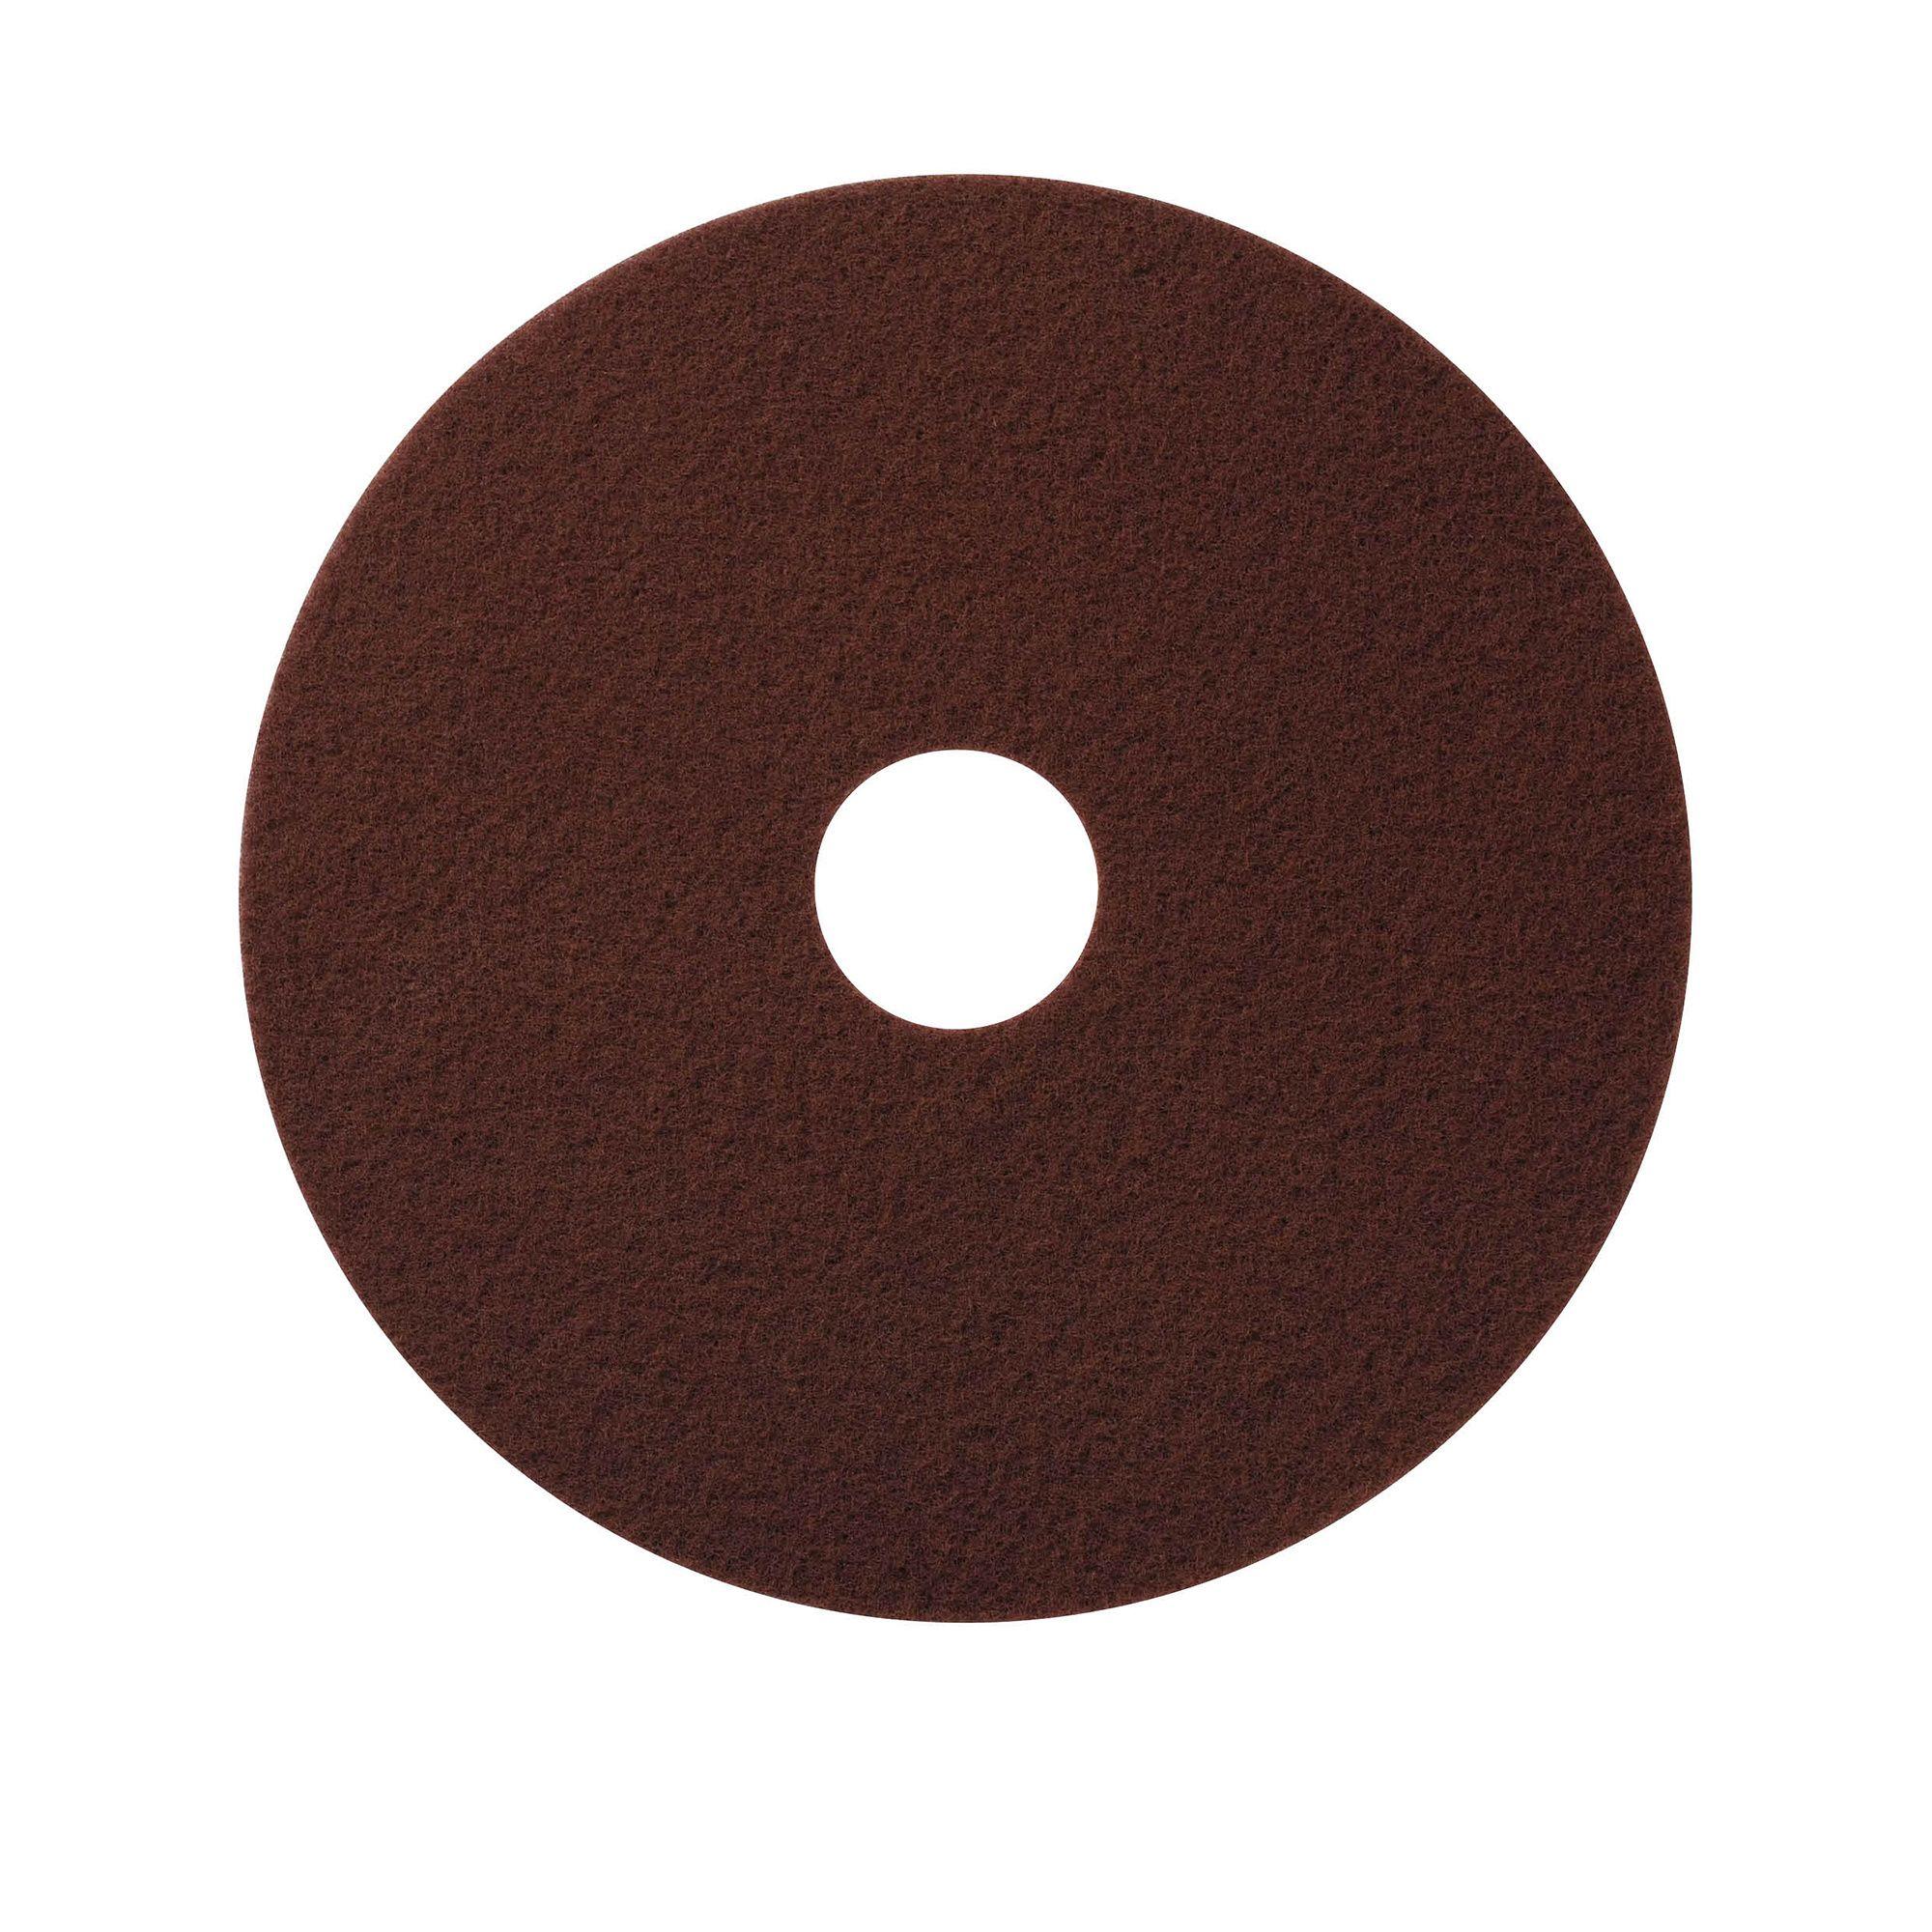 NuPad bruin (strippen zonder chemie), per 10 stuks, 11 inch / 280 mm